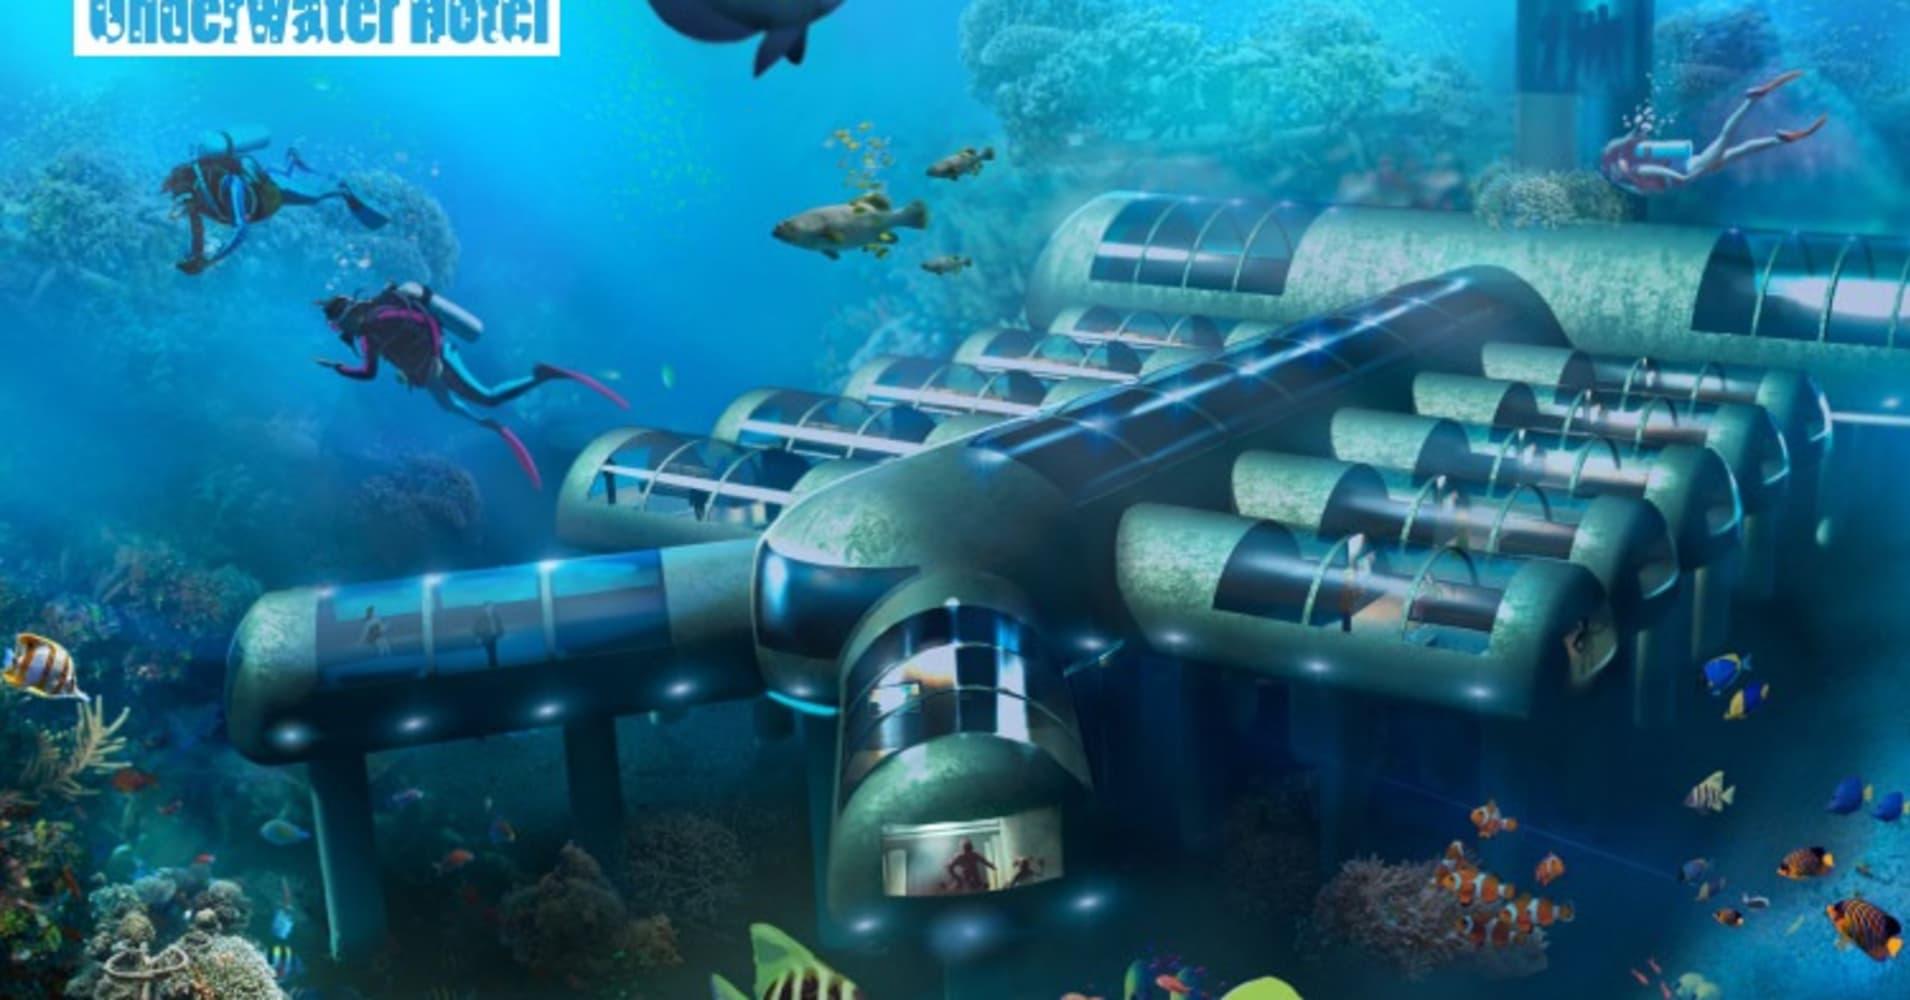 modren underwater hotel hotels miami in decor - miaowan.co